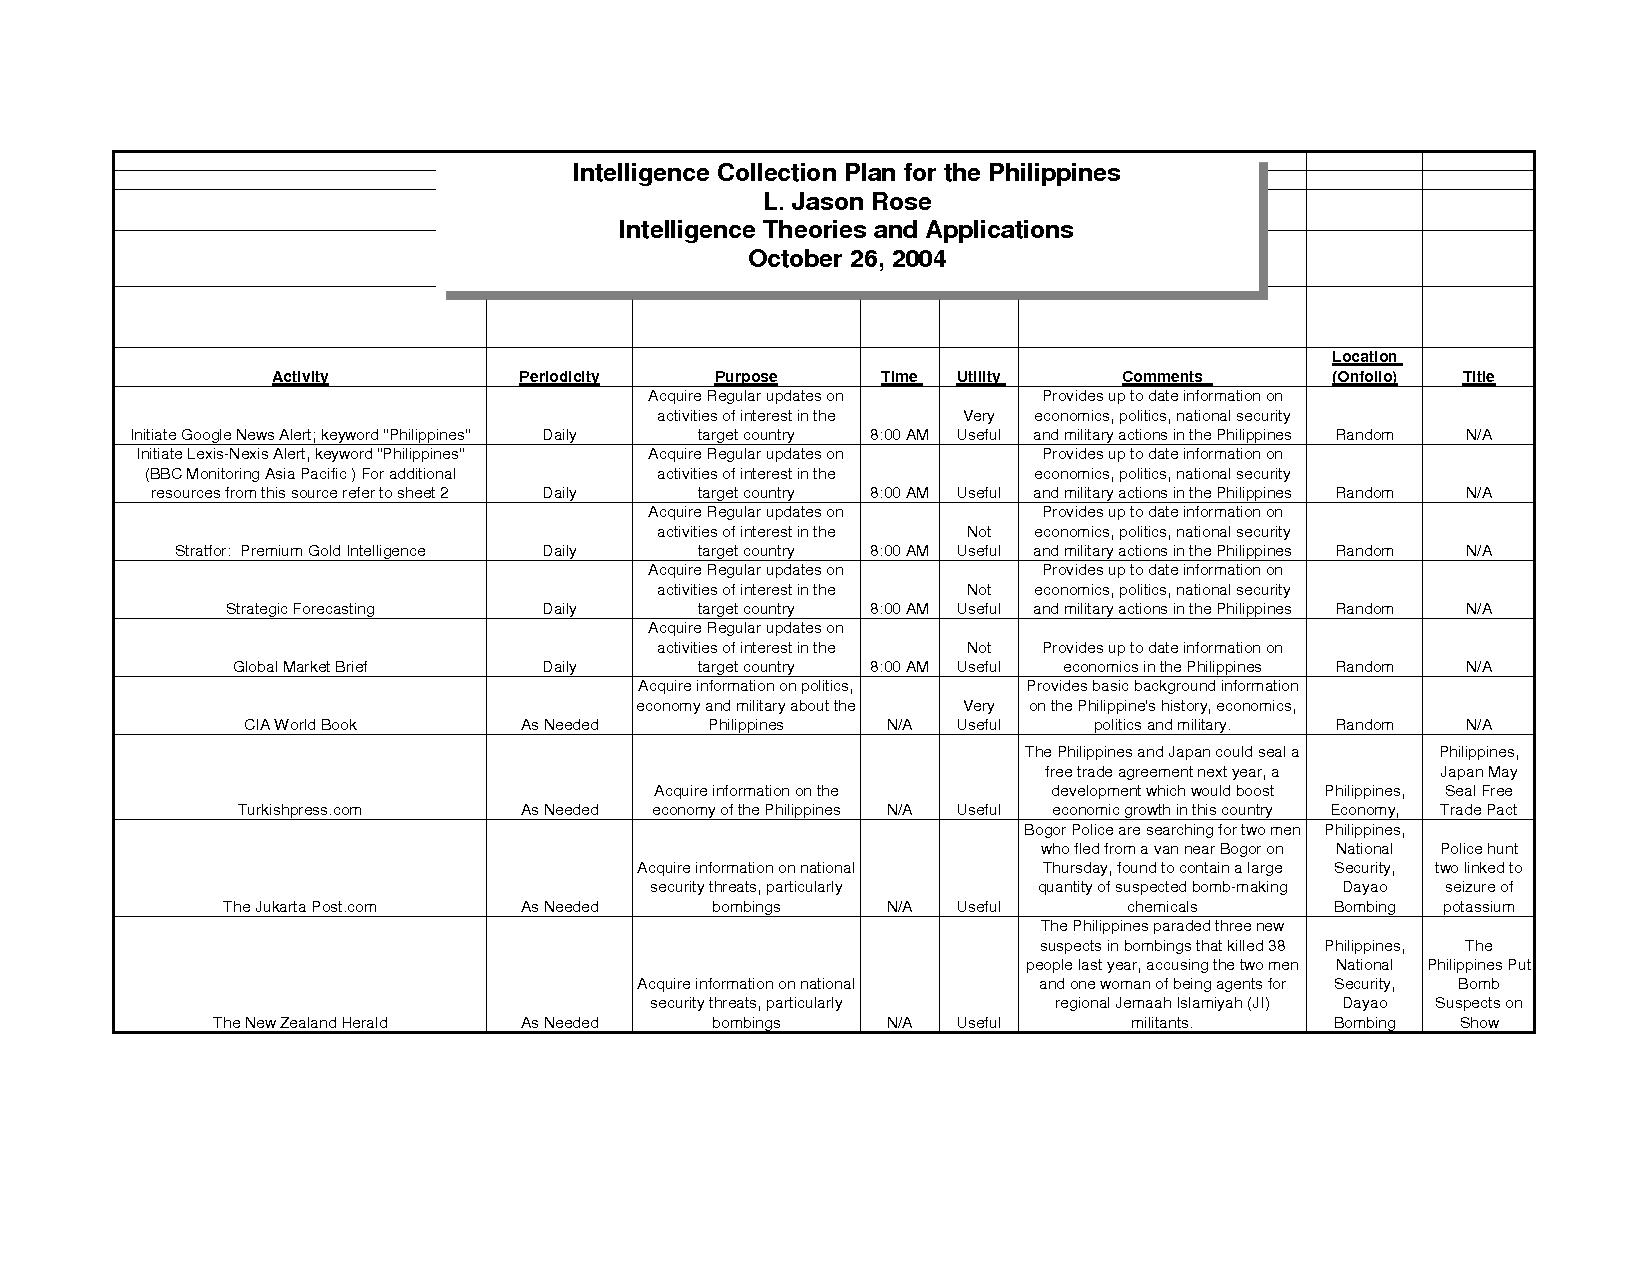 Intelligence Collection Plan Athenaxls